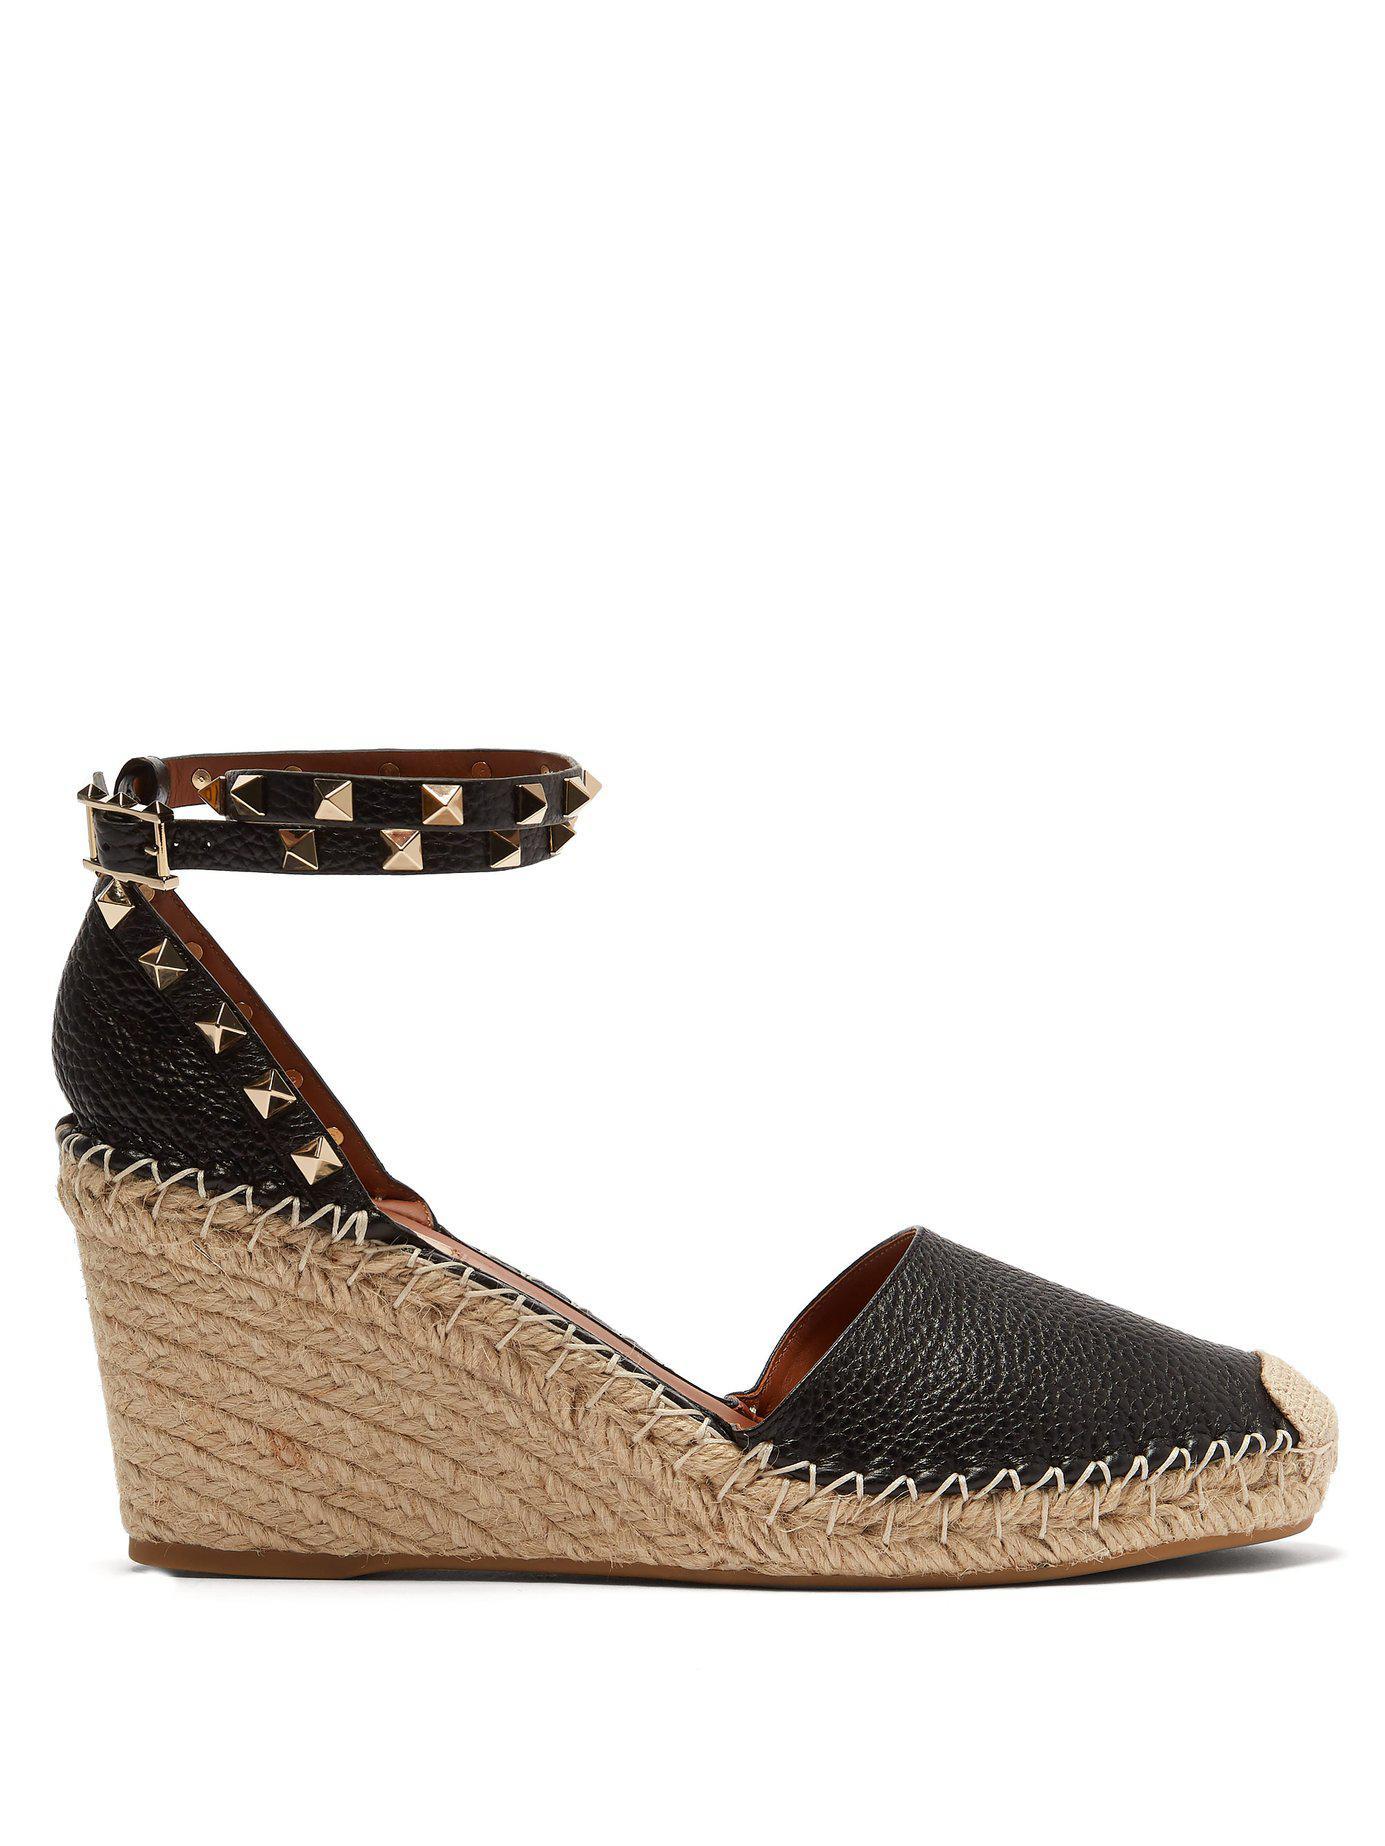 223eb6f30cf3 Valentino. Women s Black Garavani The Rockstud 85 Textured-leather  Espadrille Wedge Sandals